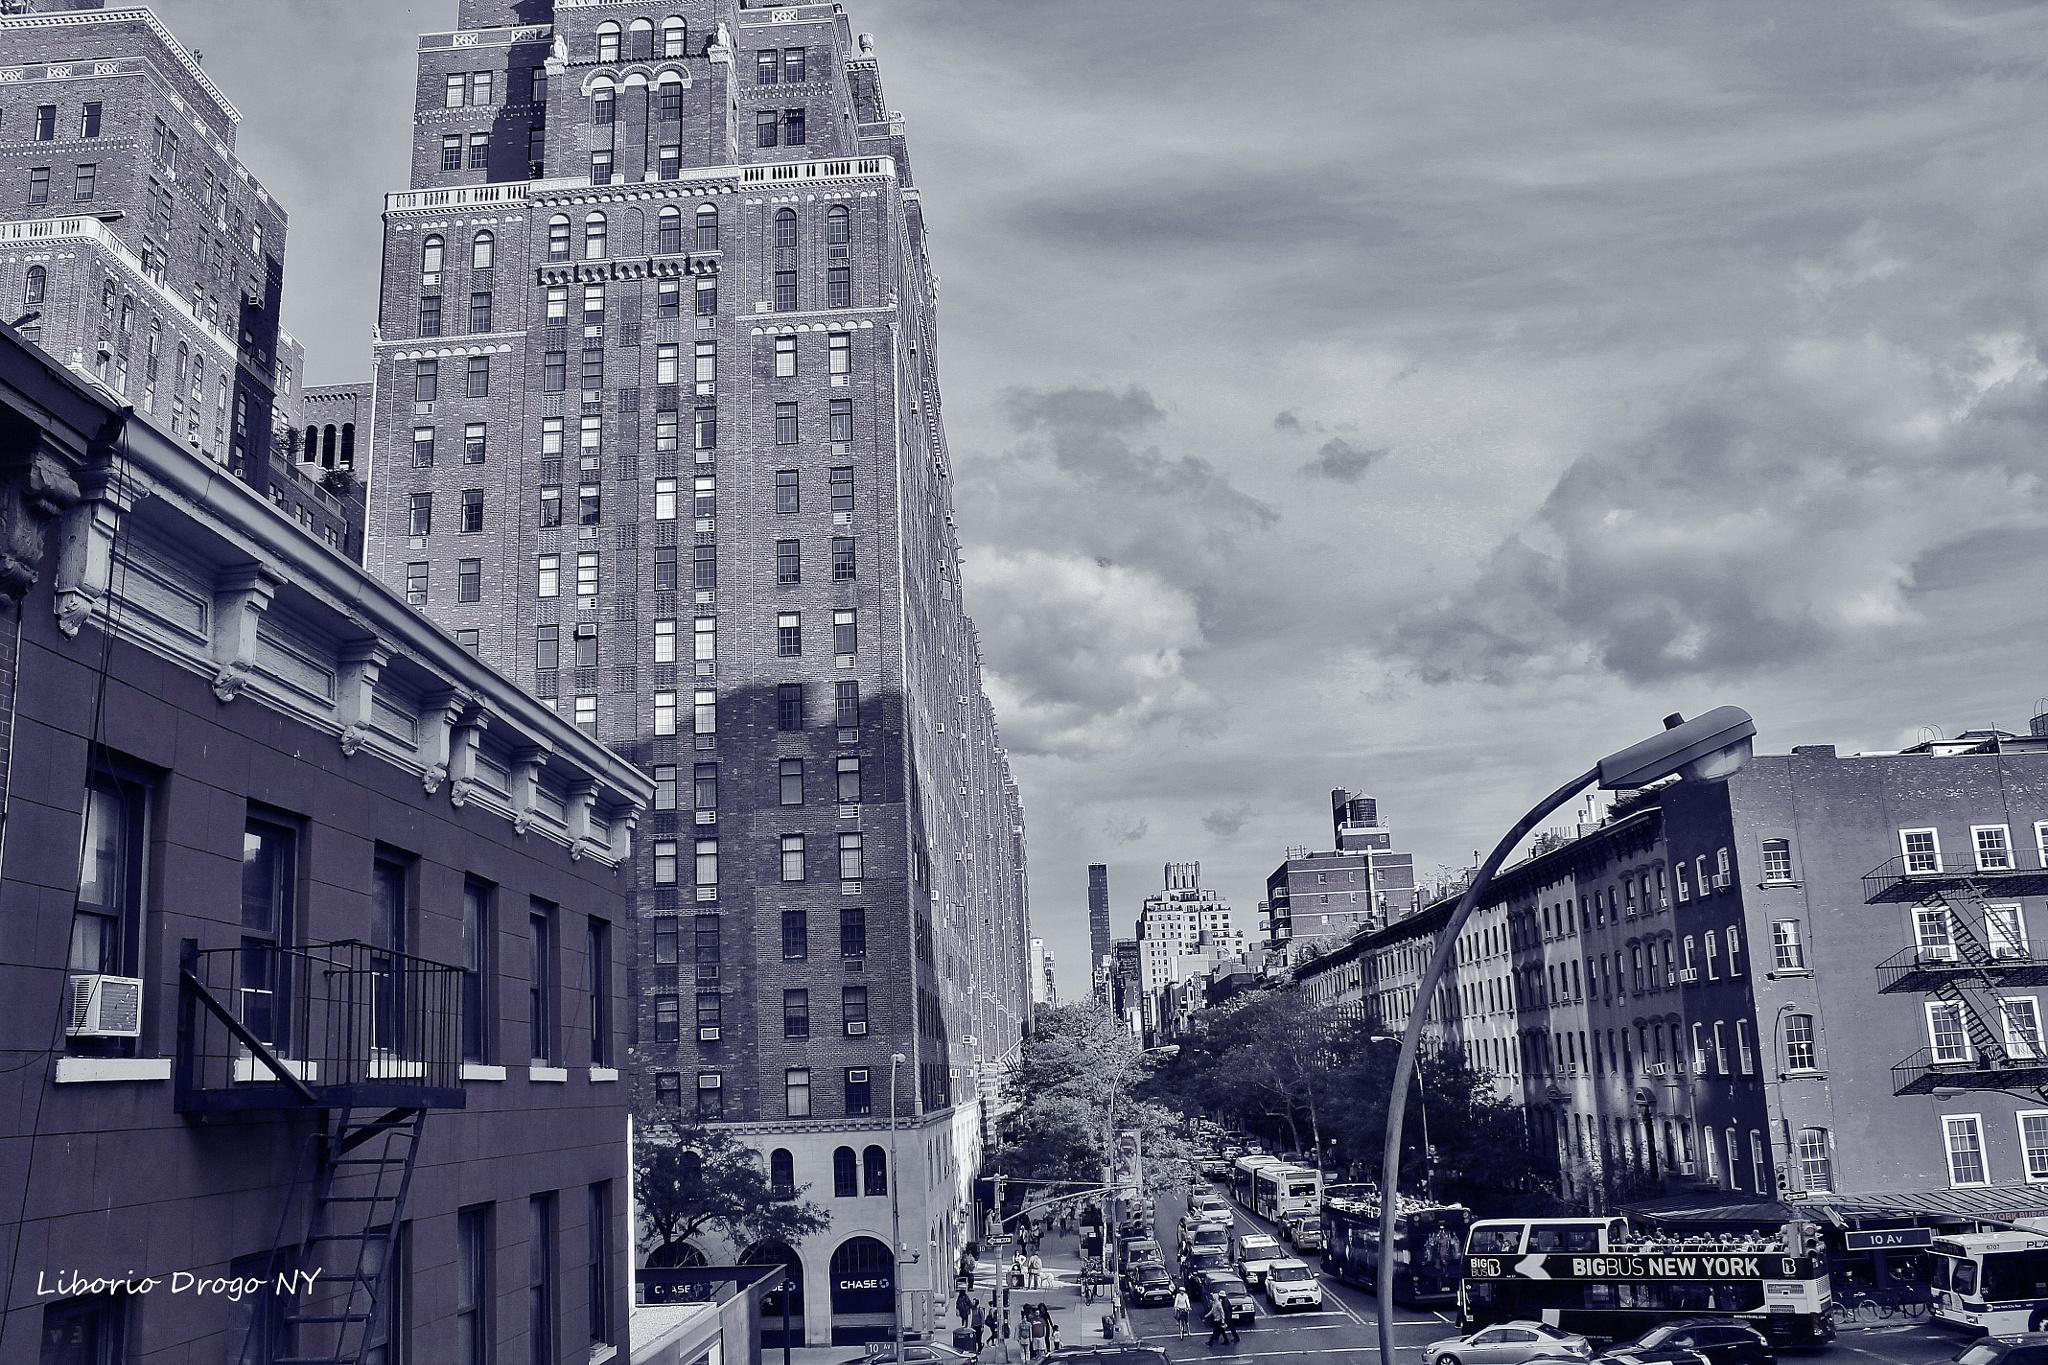 Street Photography, by Liborio Drogo